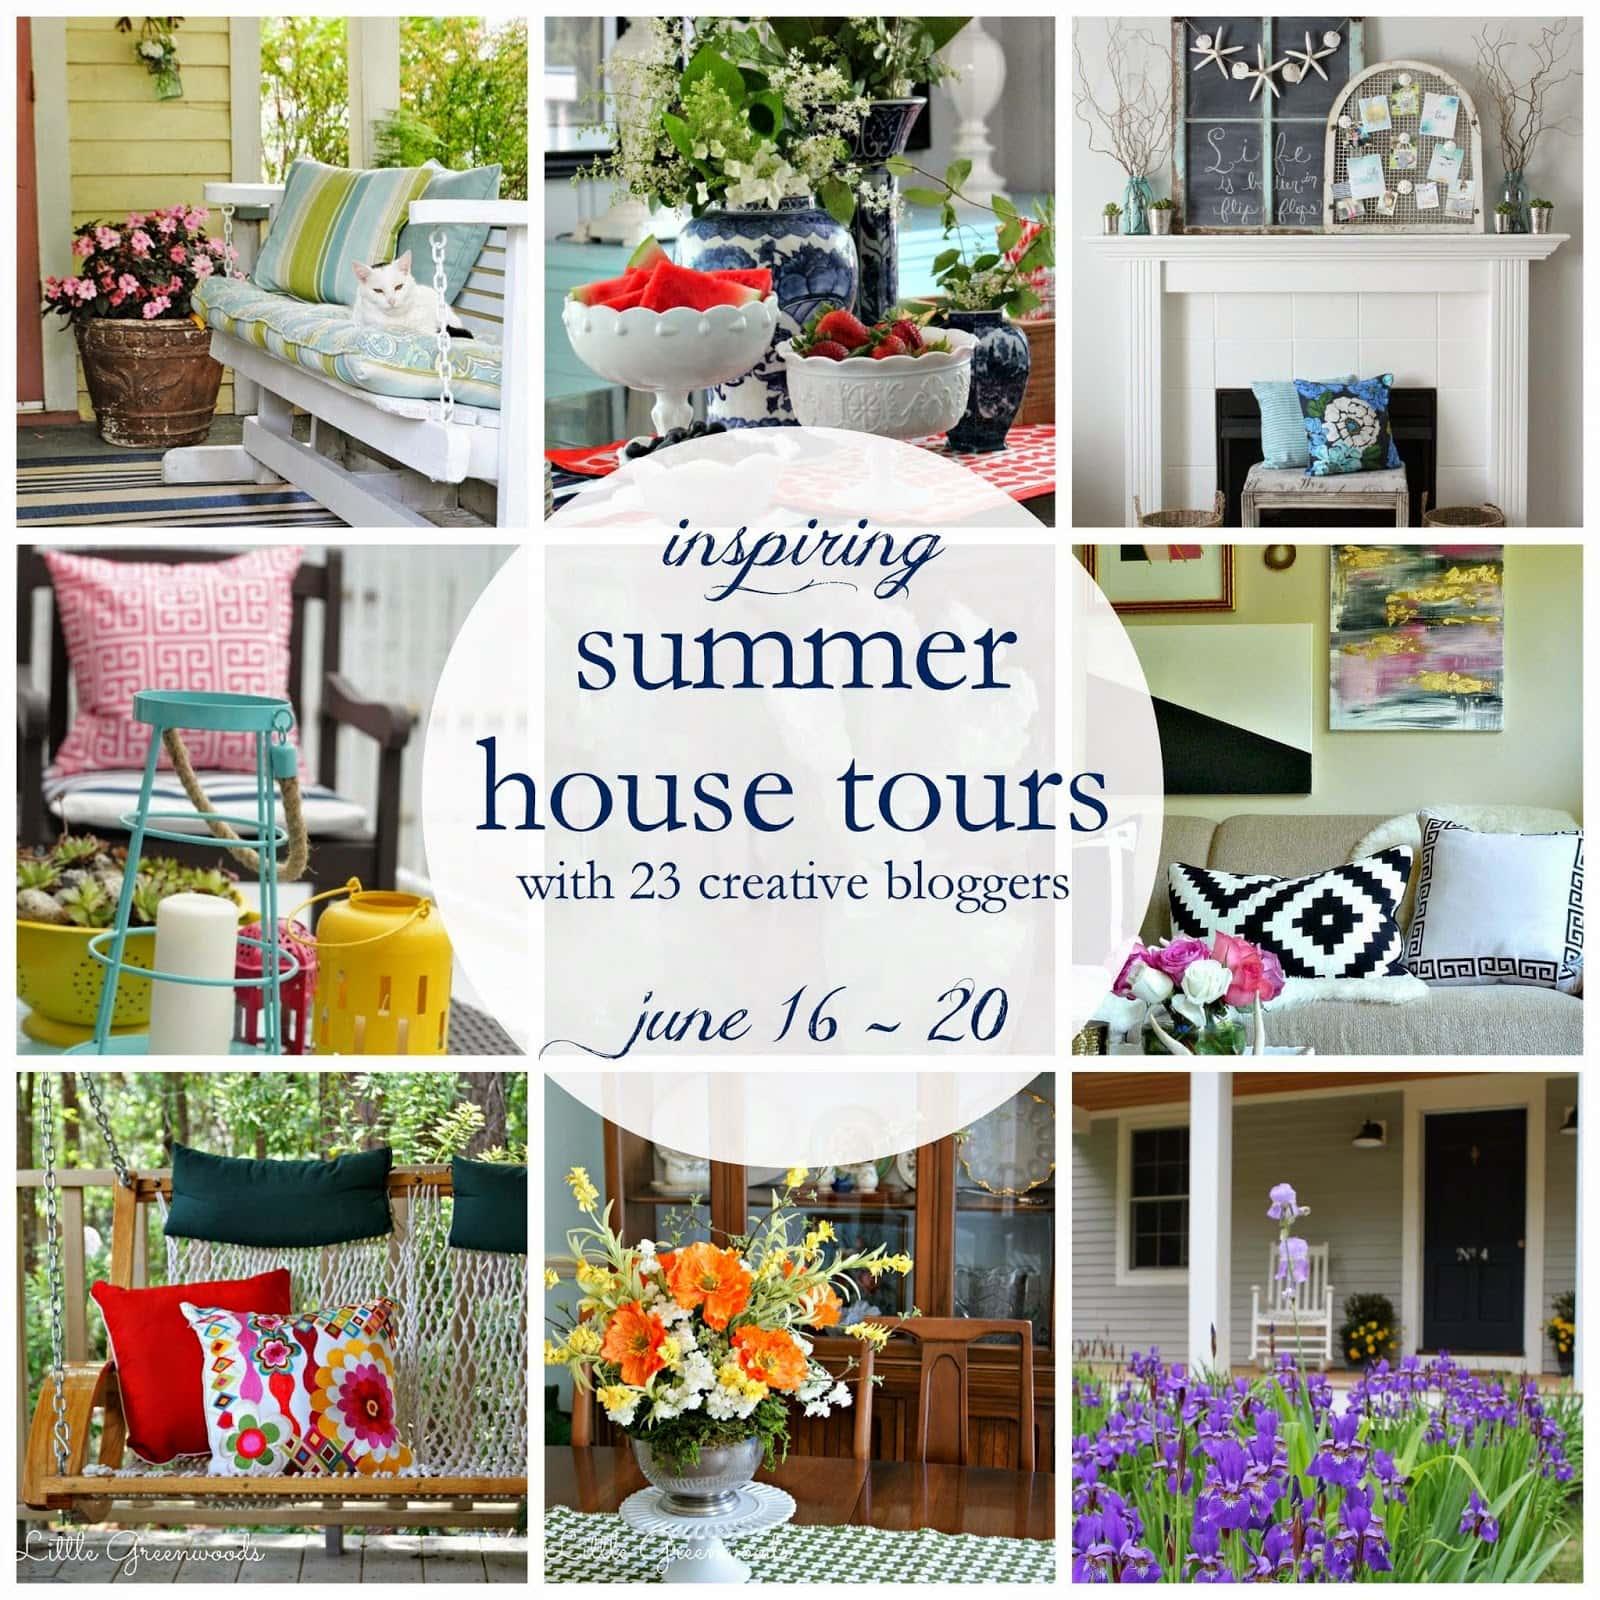 Inspiring summer house tours poster.